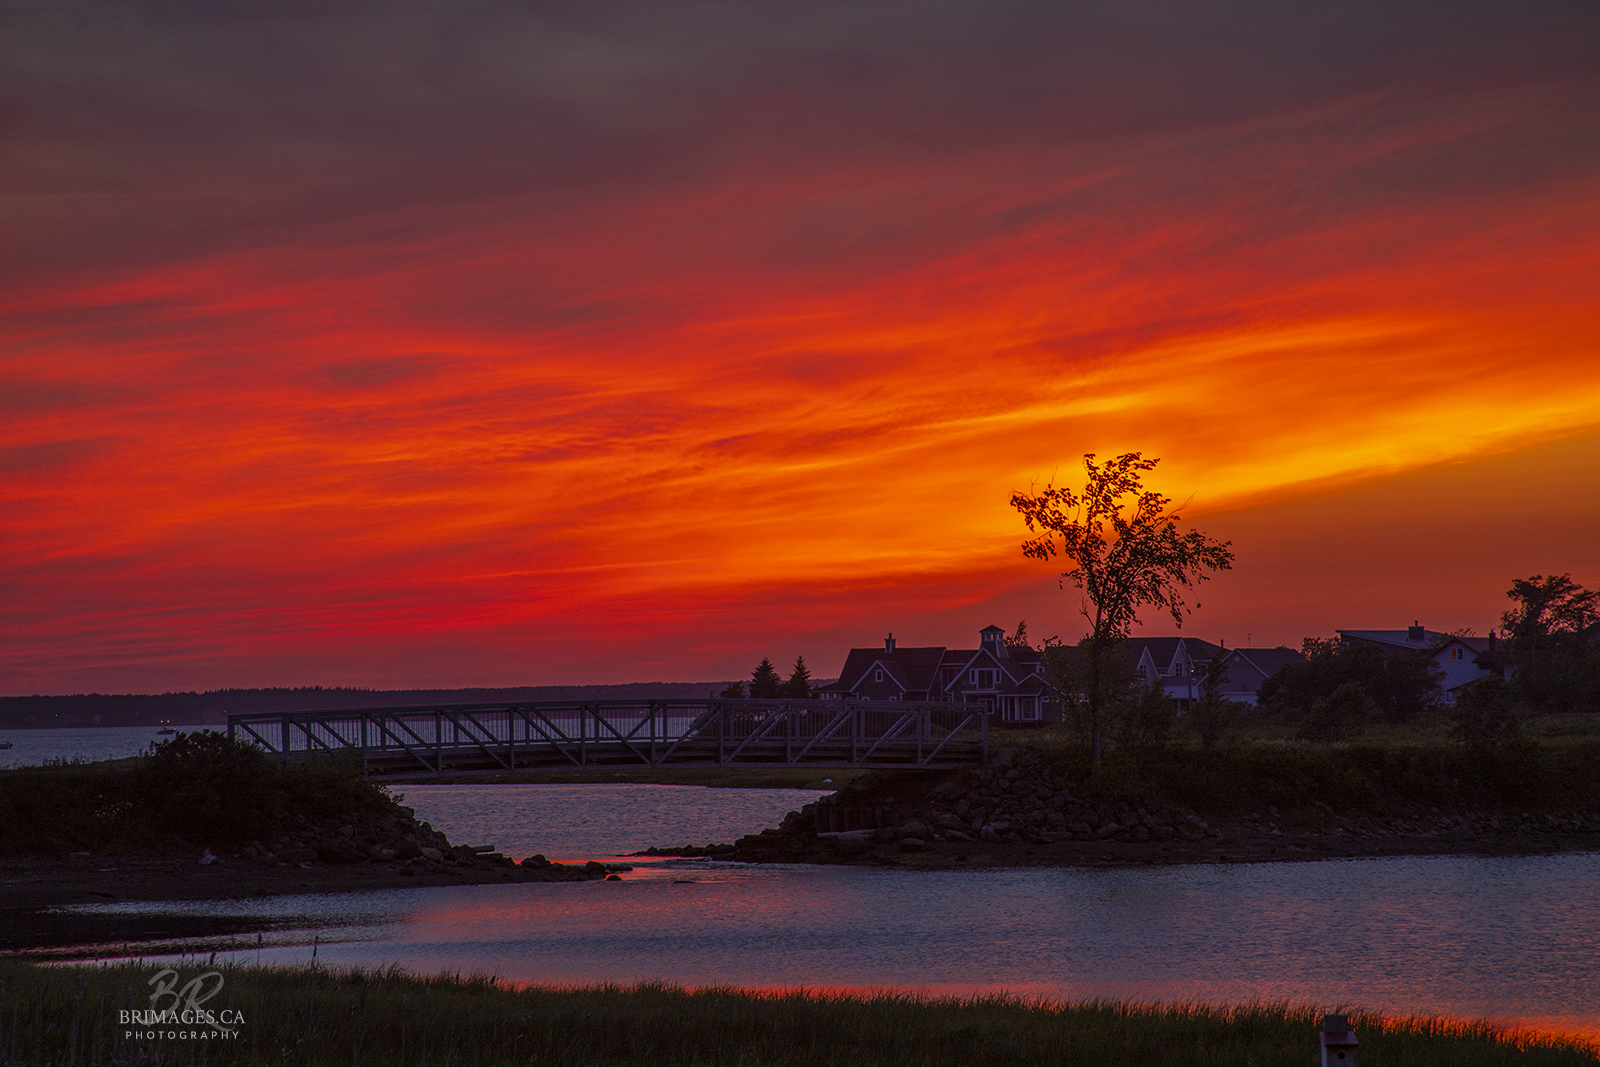 sunset-pointe-du-chene-new-brunswick-canada (7) -BRimages.ca